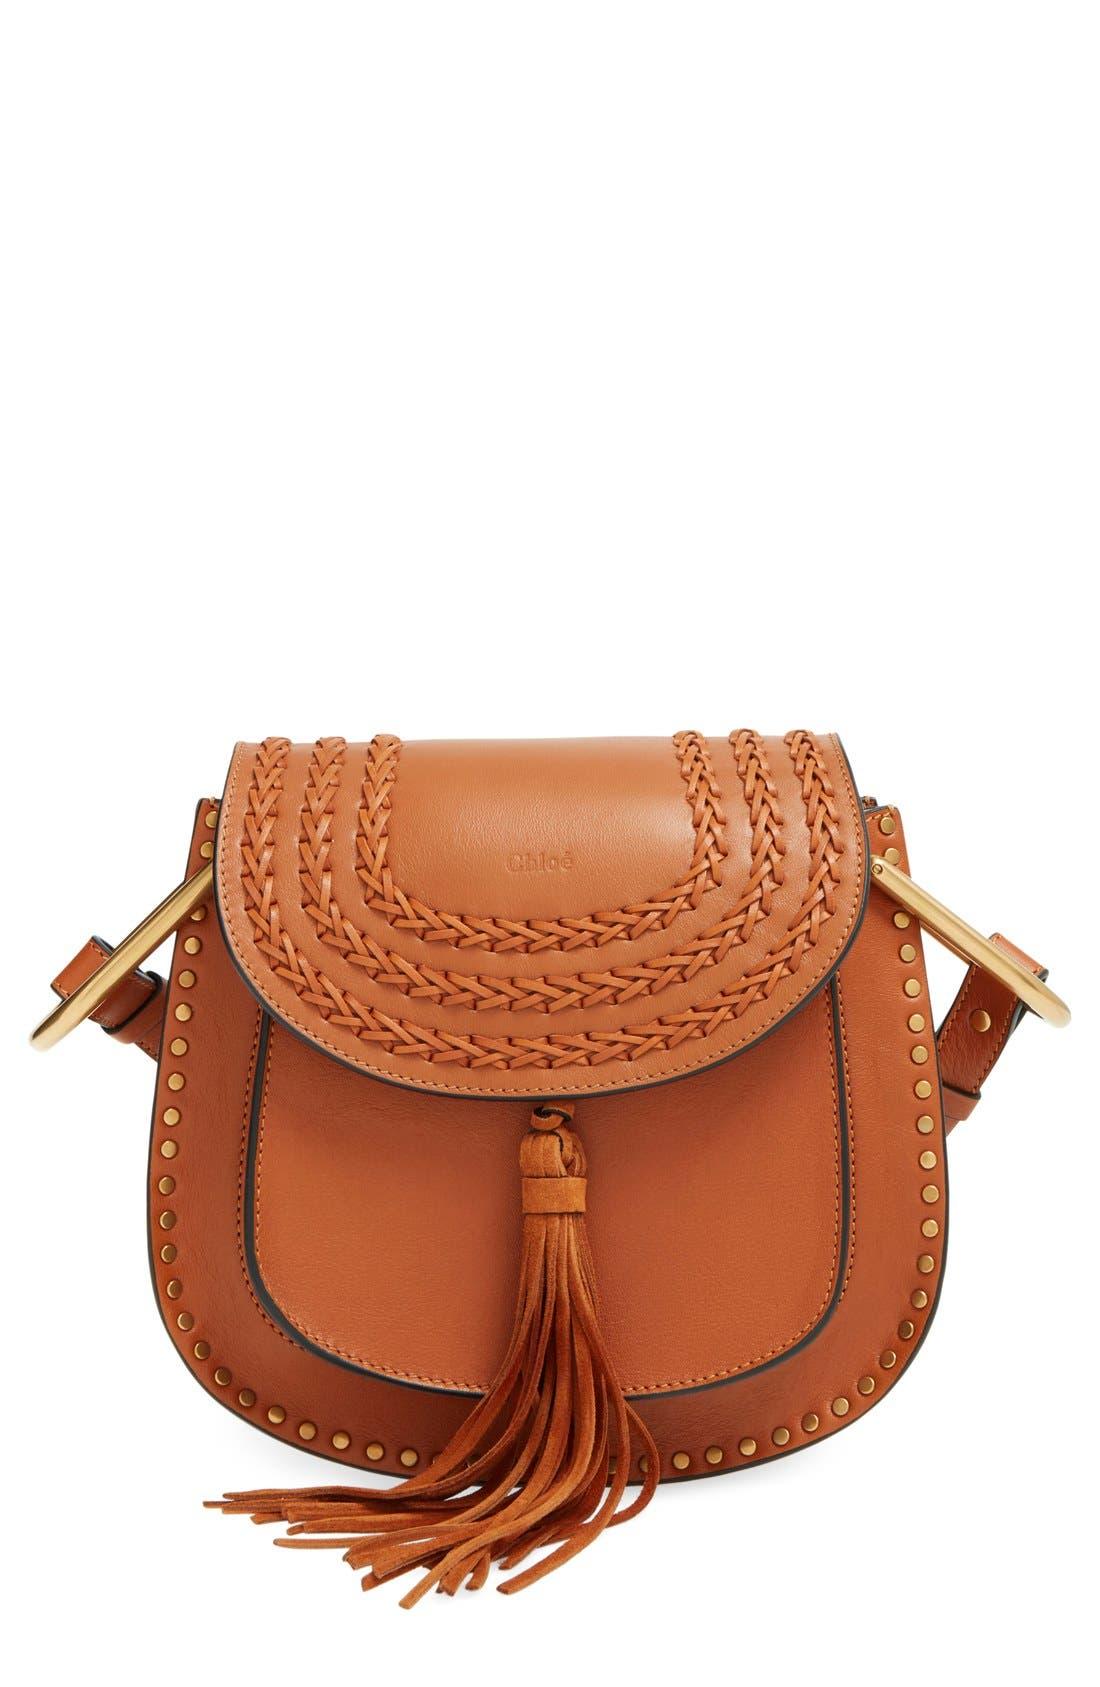 'Small Hudson' Studded Calfskin Leather Crossbody Bag,                             Main thumbnail 1, color,                             Caramel